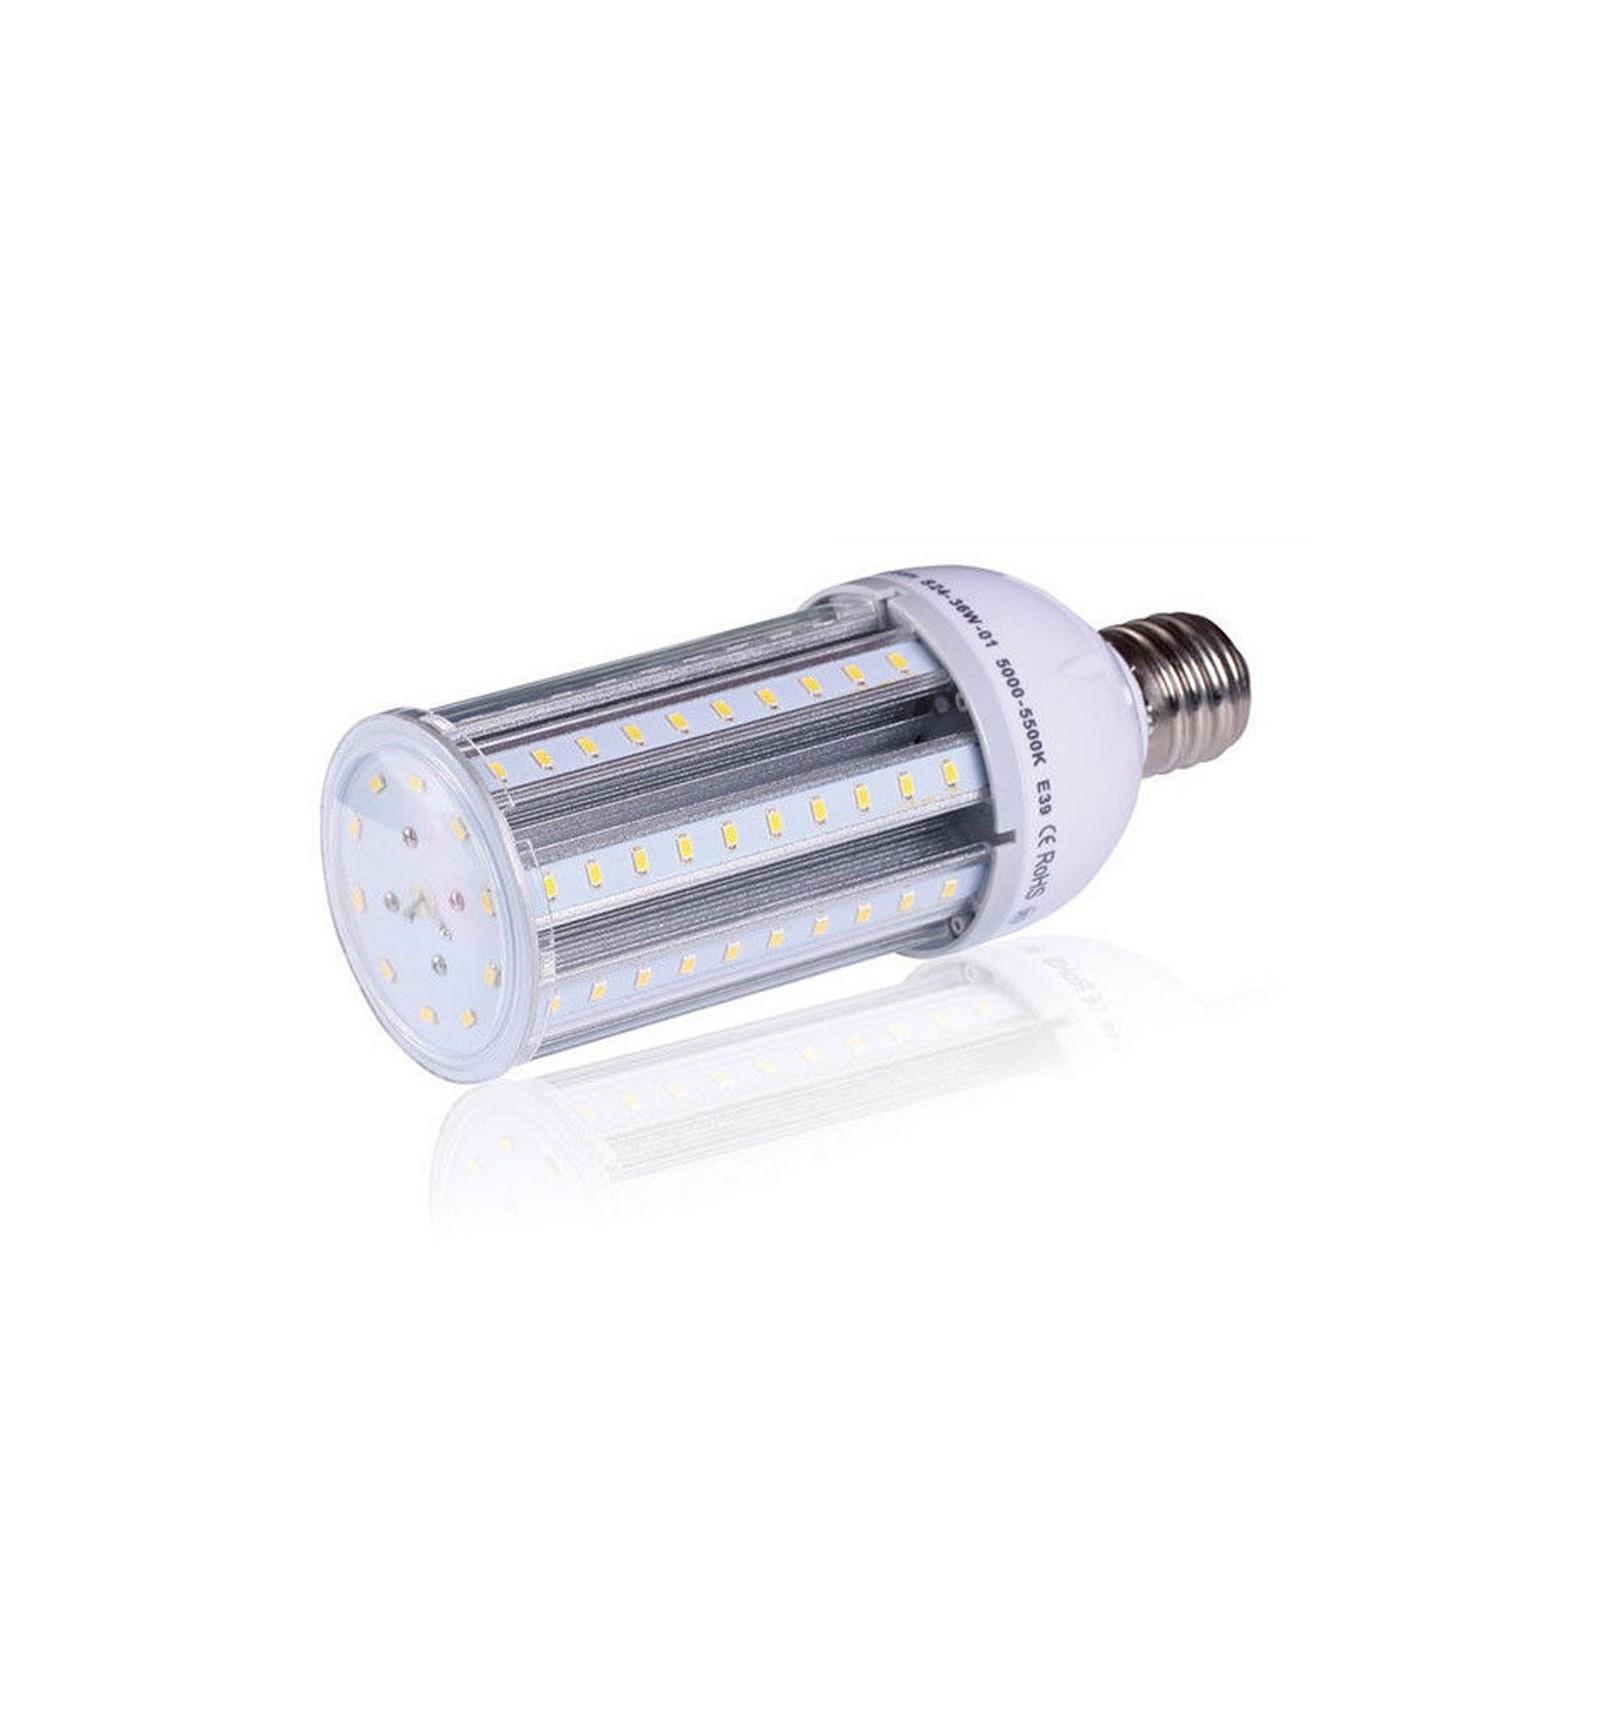 Led Public 54w E27 Ampoule 6000k Eclairage XukPiOZ